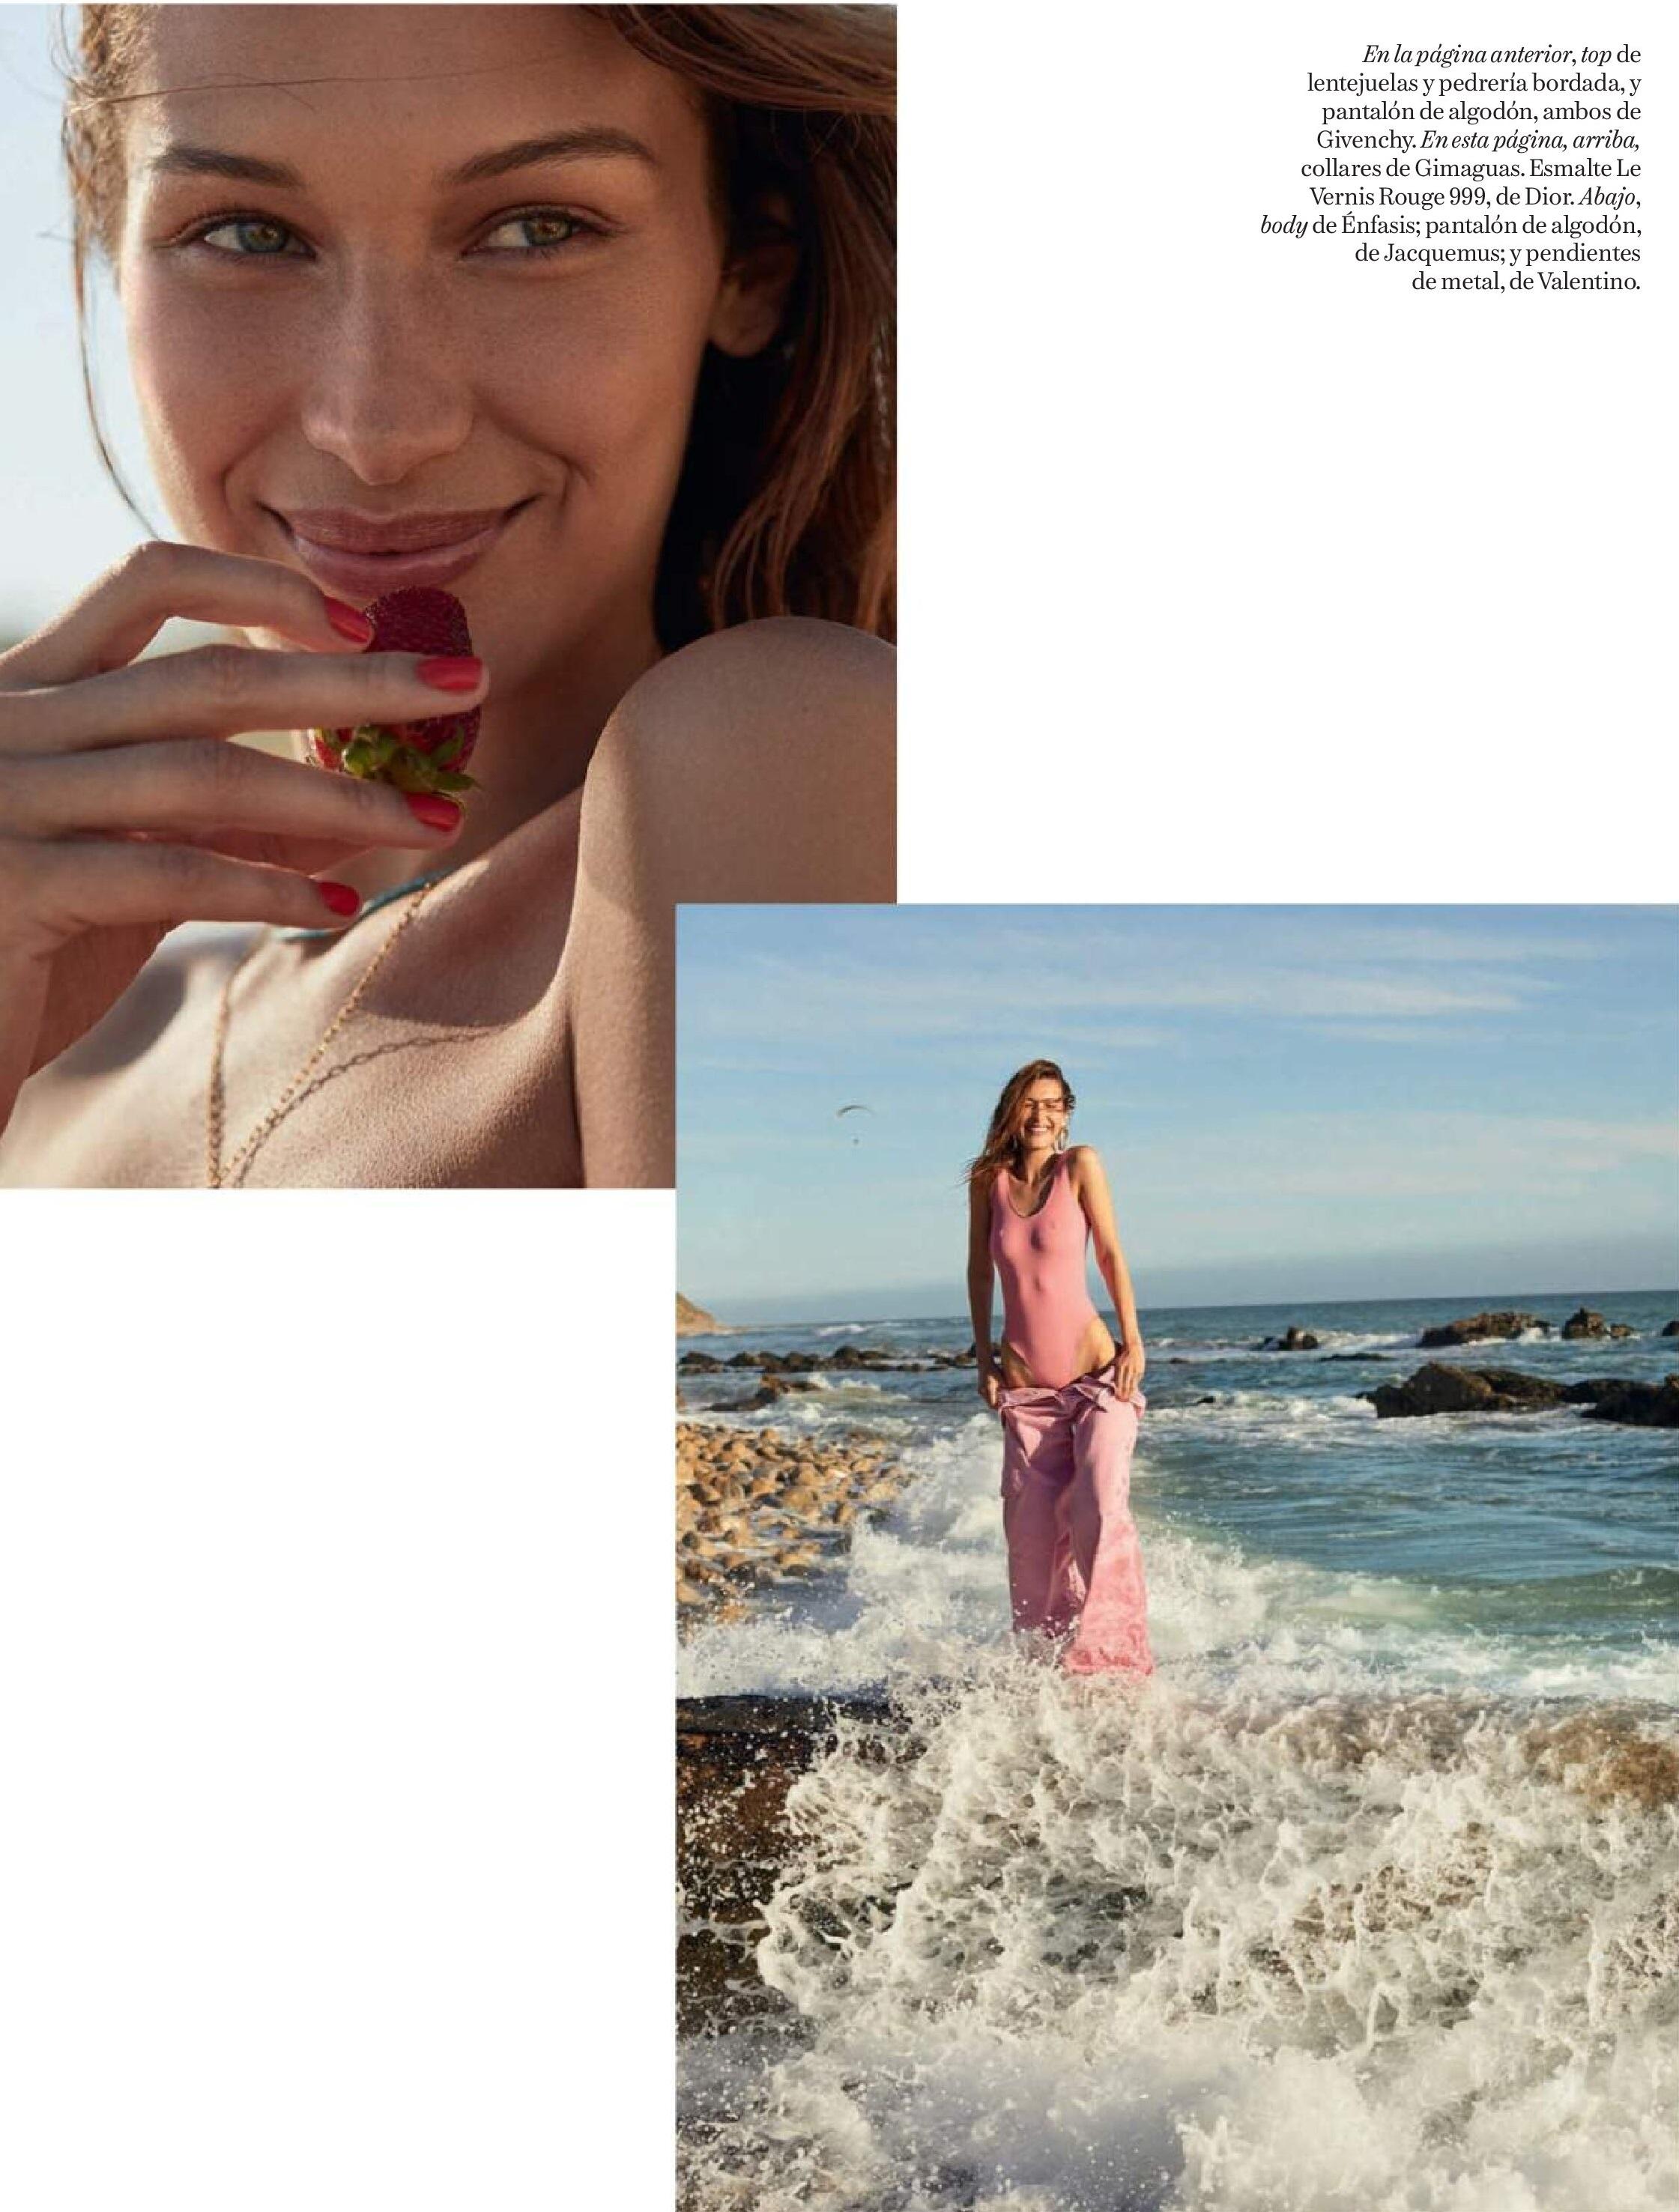 Bella Hadid by Zoey Grossman for Vogue Spain June 2019 (13).jpg